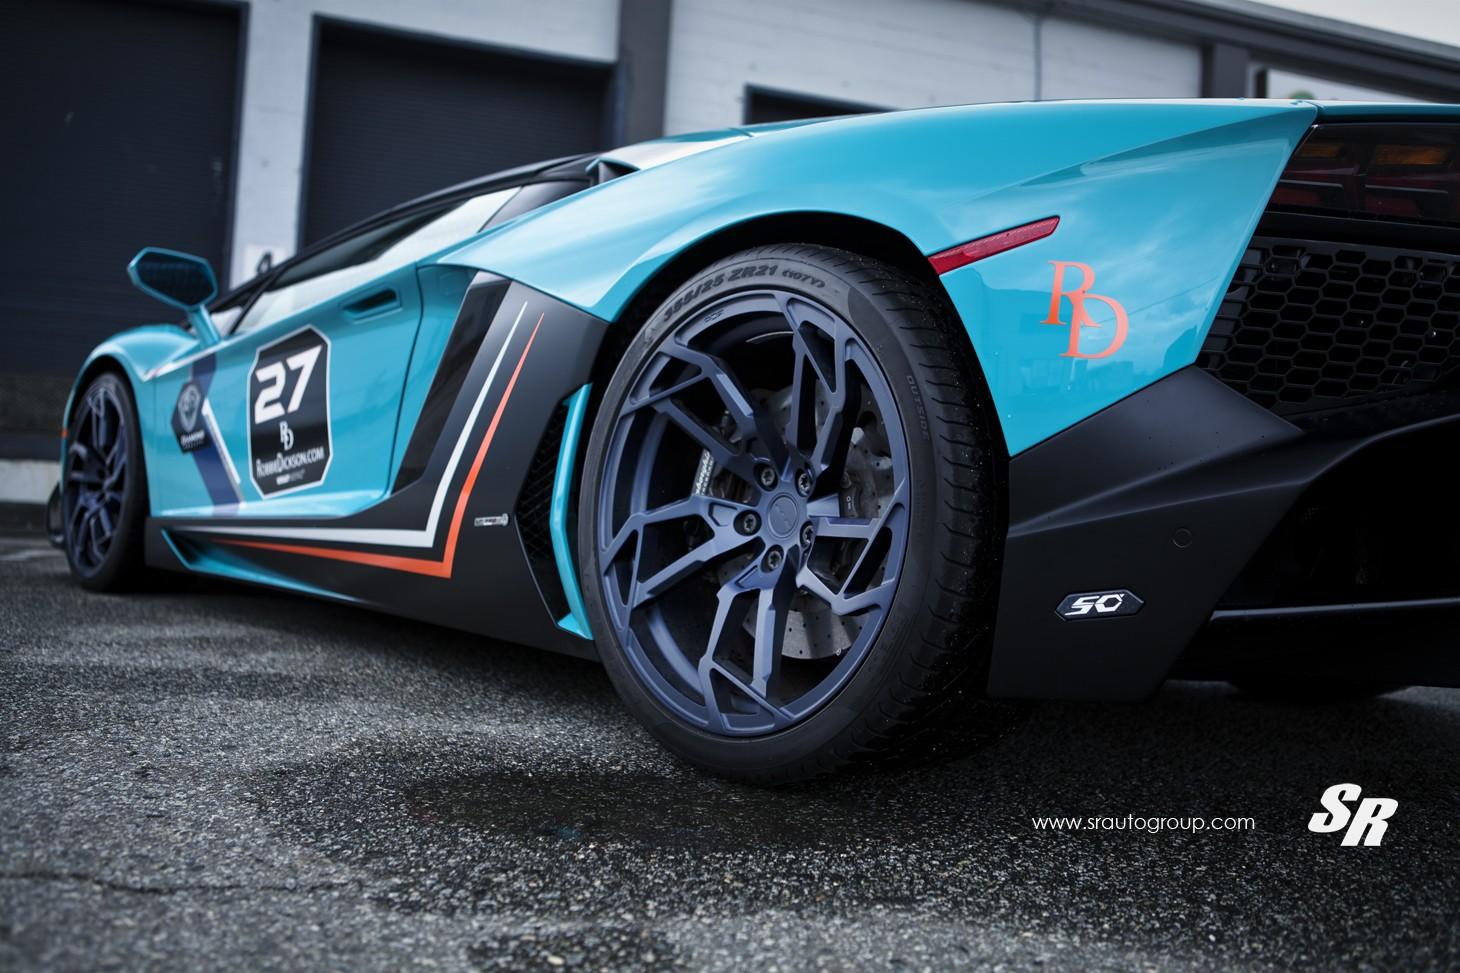 Baby Blue Lamborghini Aventador Gets Pur Wheels Lp720